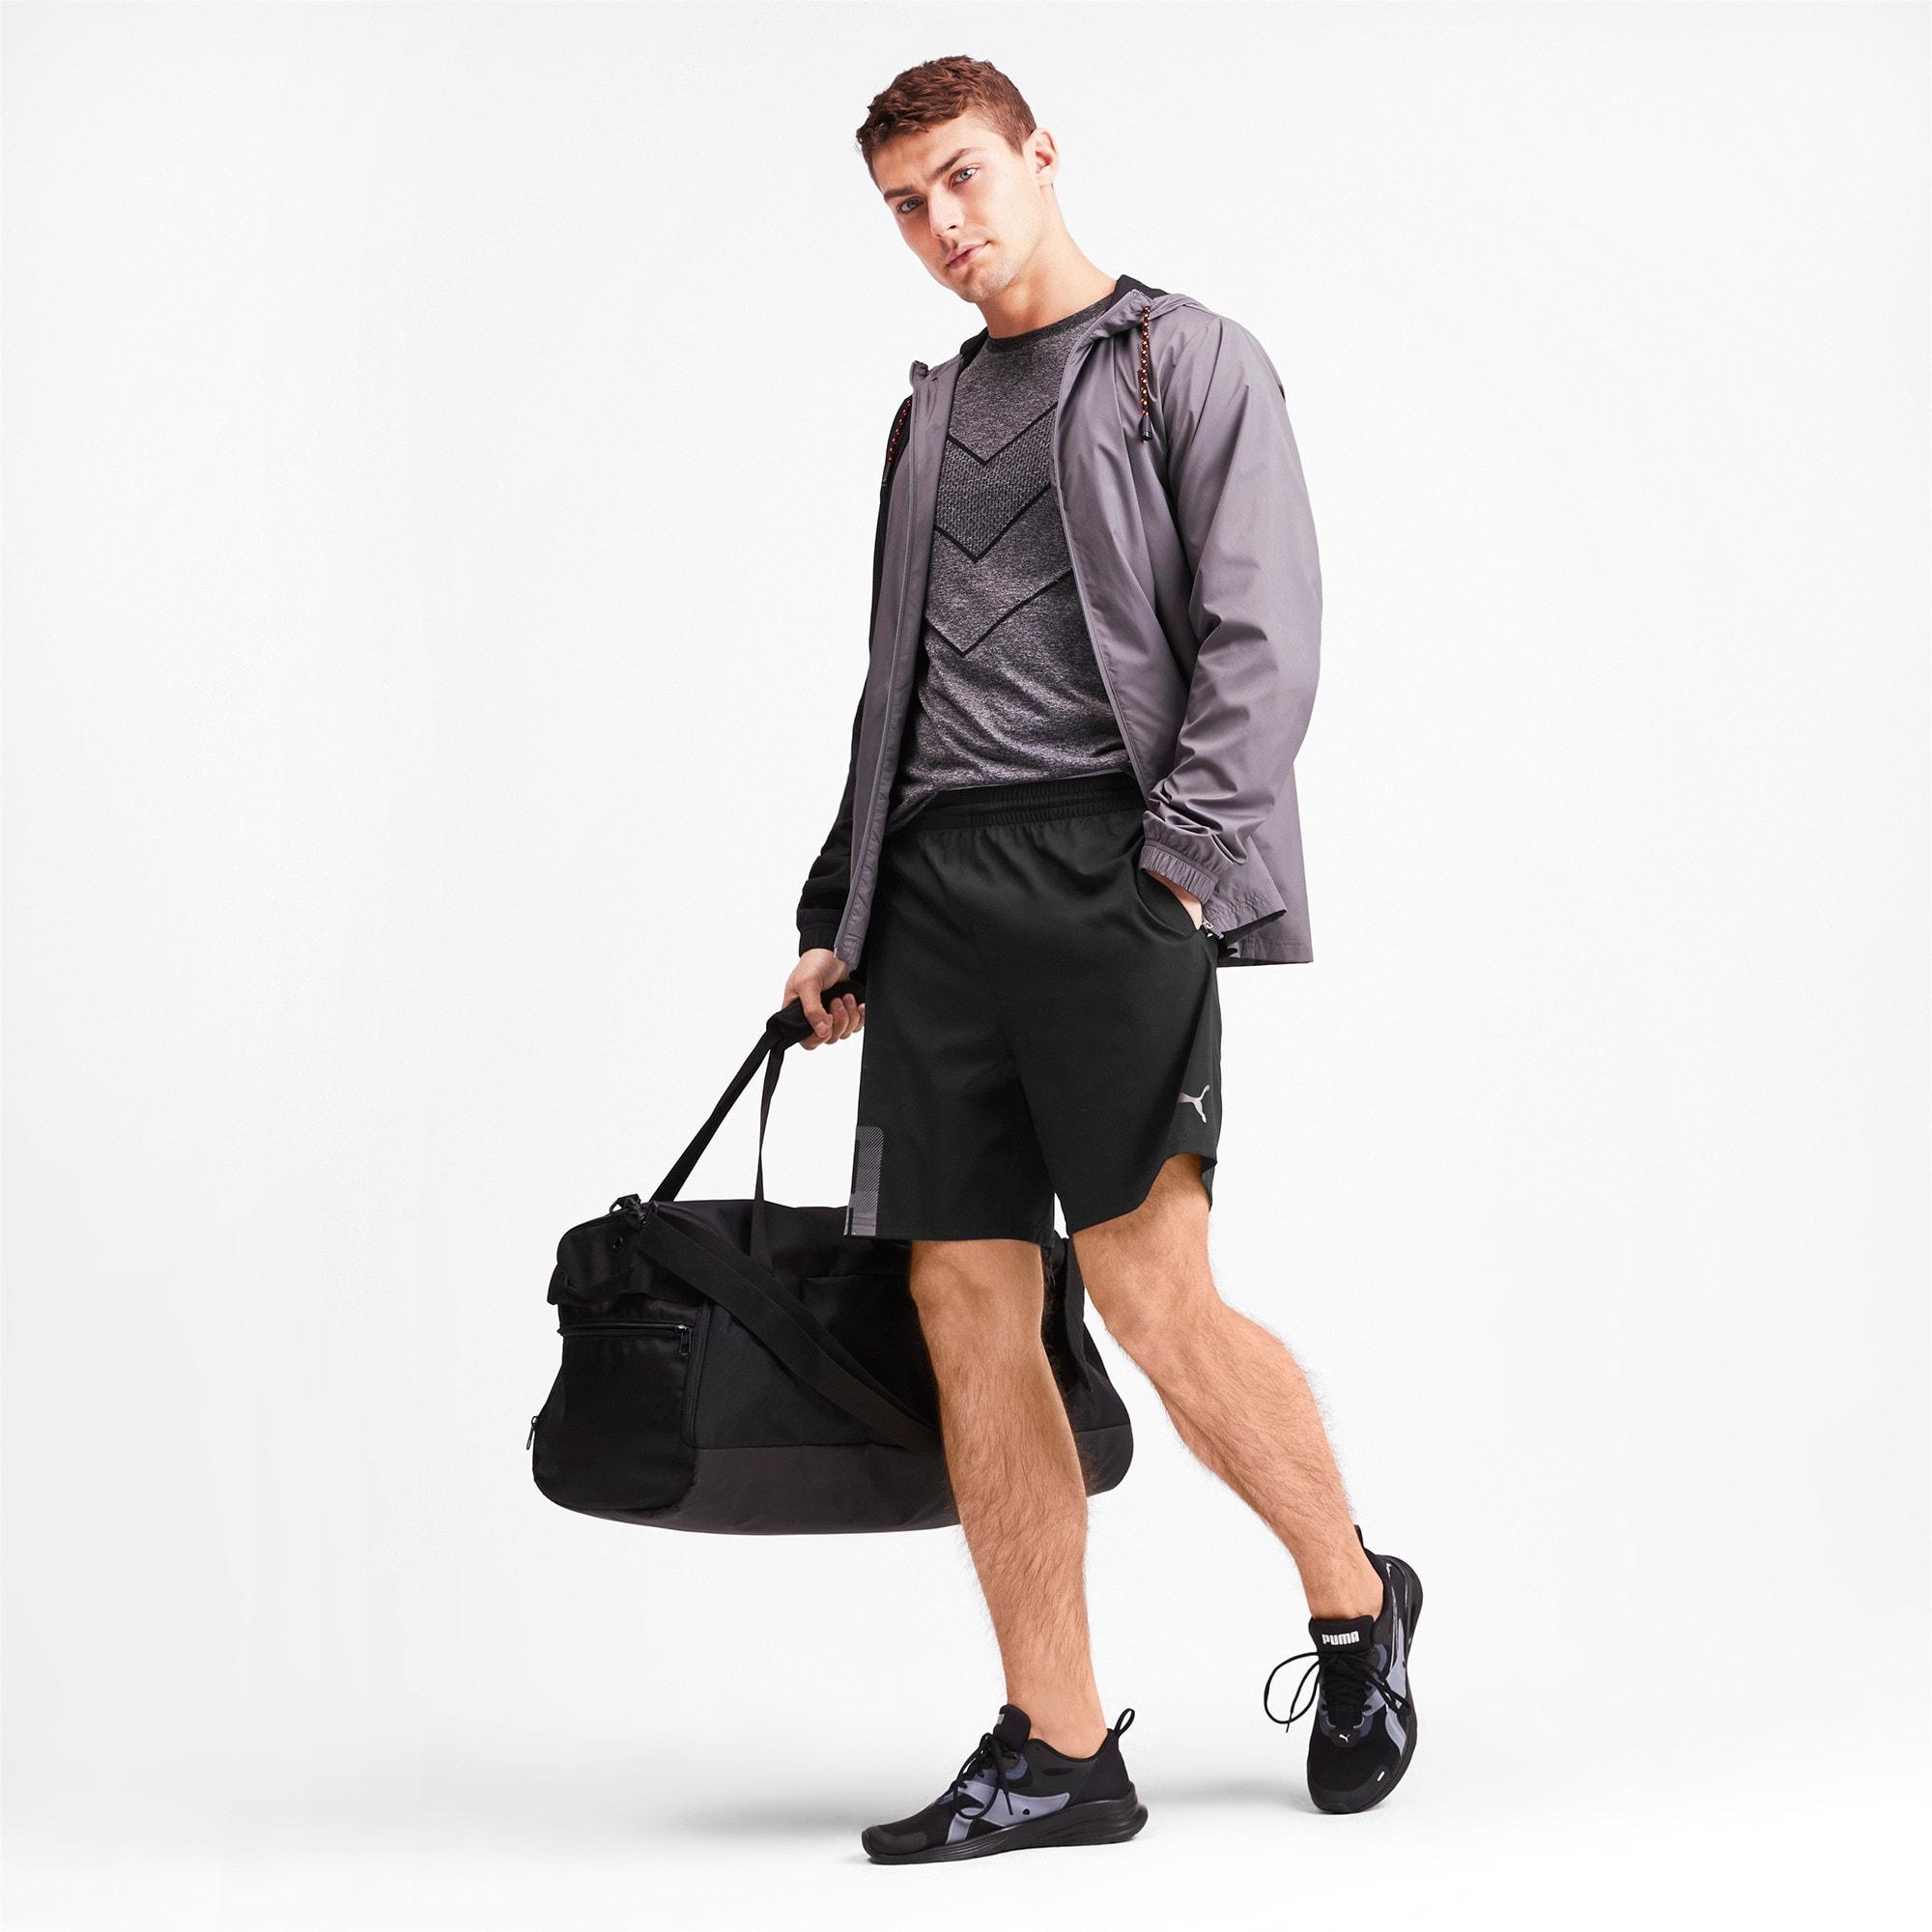 Thumbnail 3 of Collective Woven Men's Training Shorts, Puma Black, medium